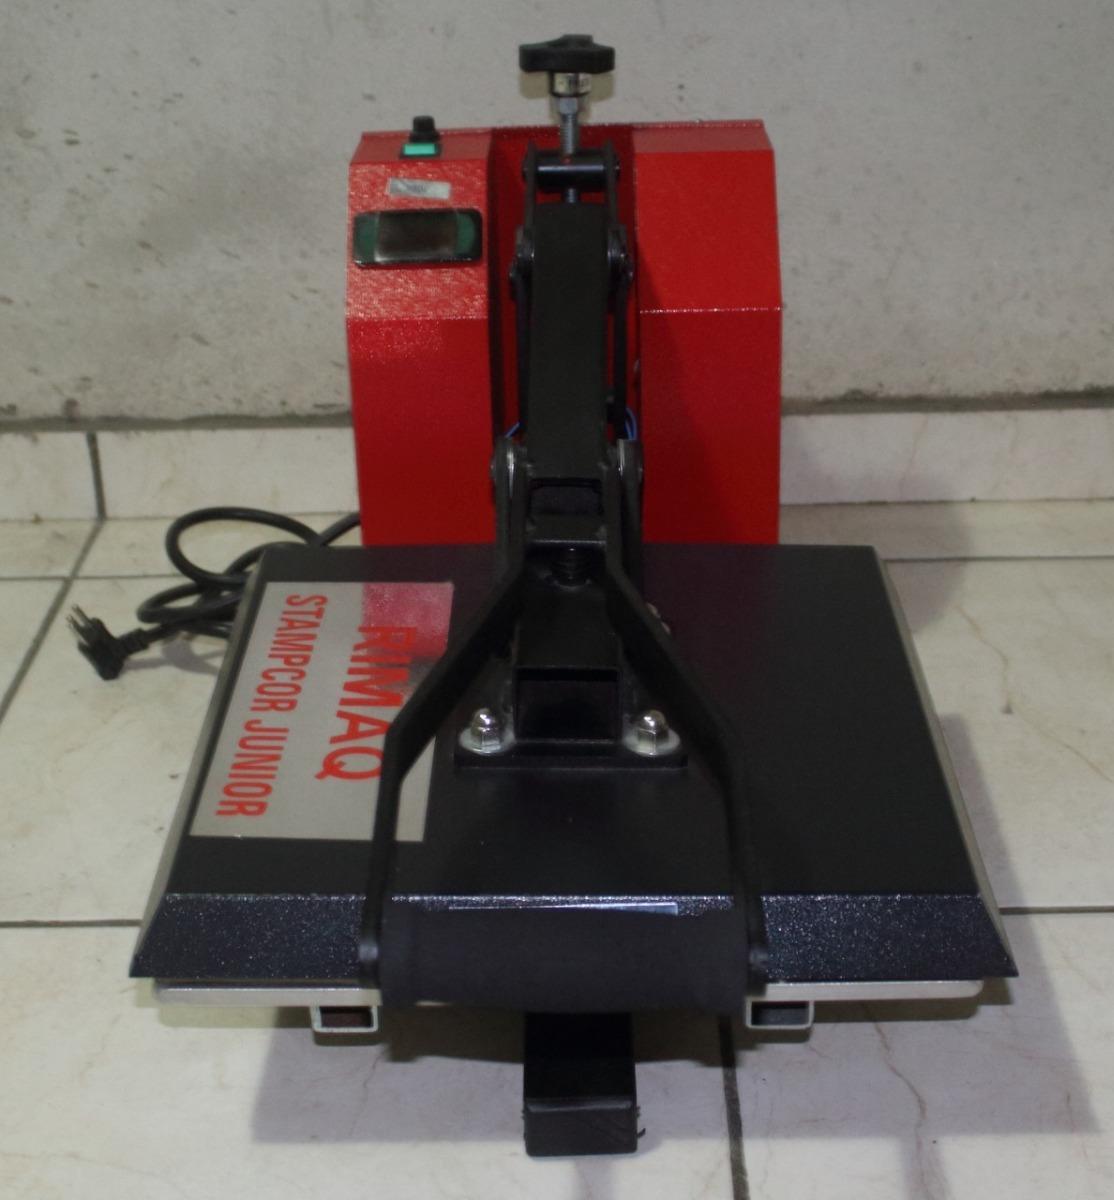 maquina de estampar - stampcor junior - rimaq. Carregando zoom. a8fbf1f6ba2eb